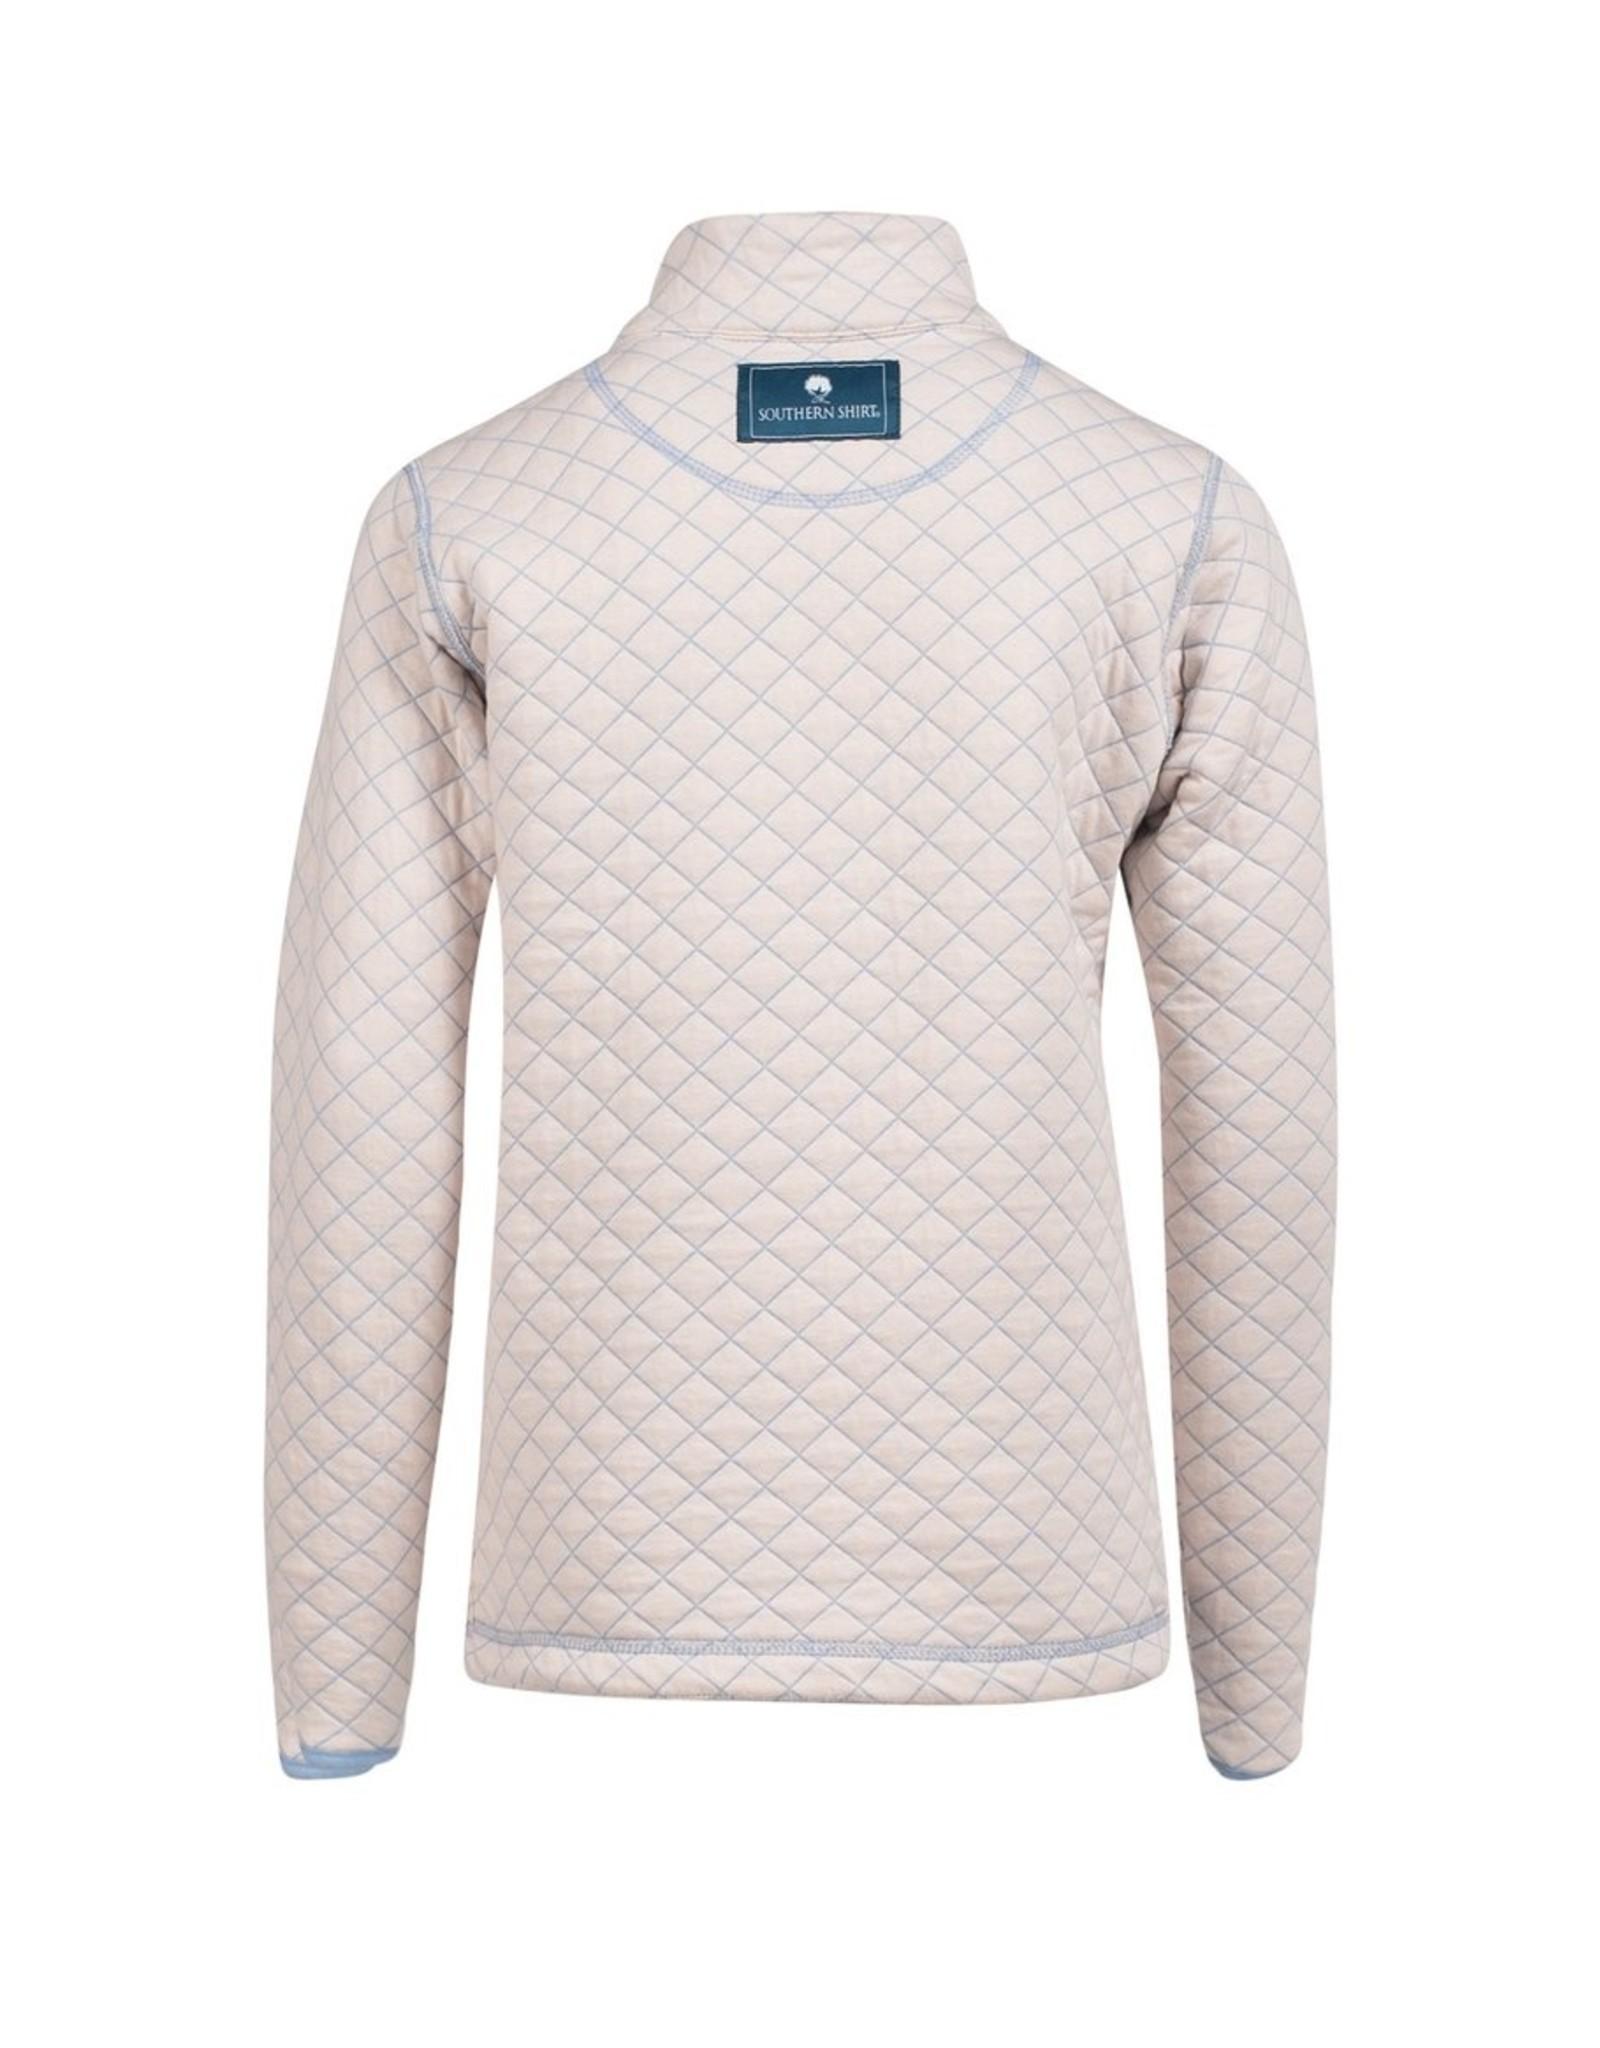 Southern Shirt Girls Adventure Pullover/6V001